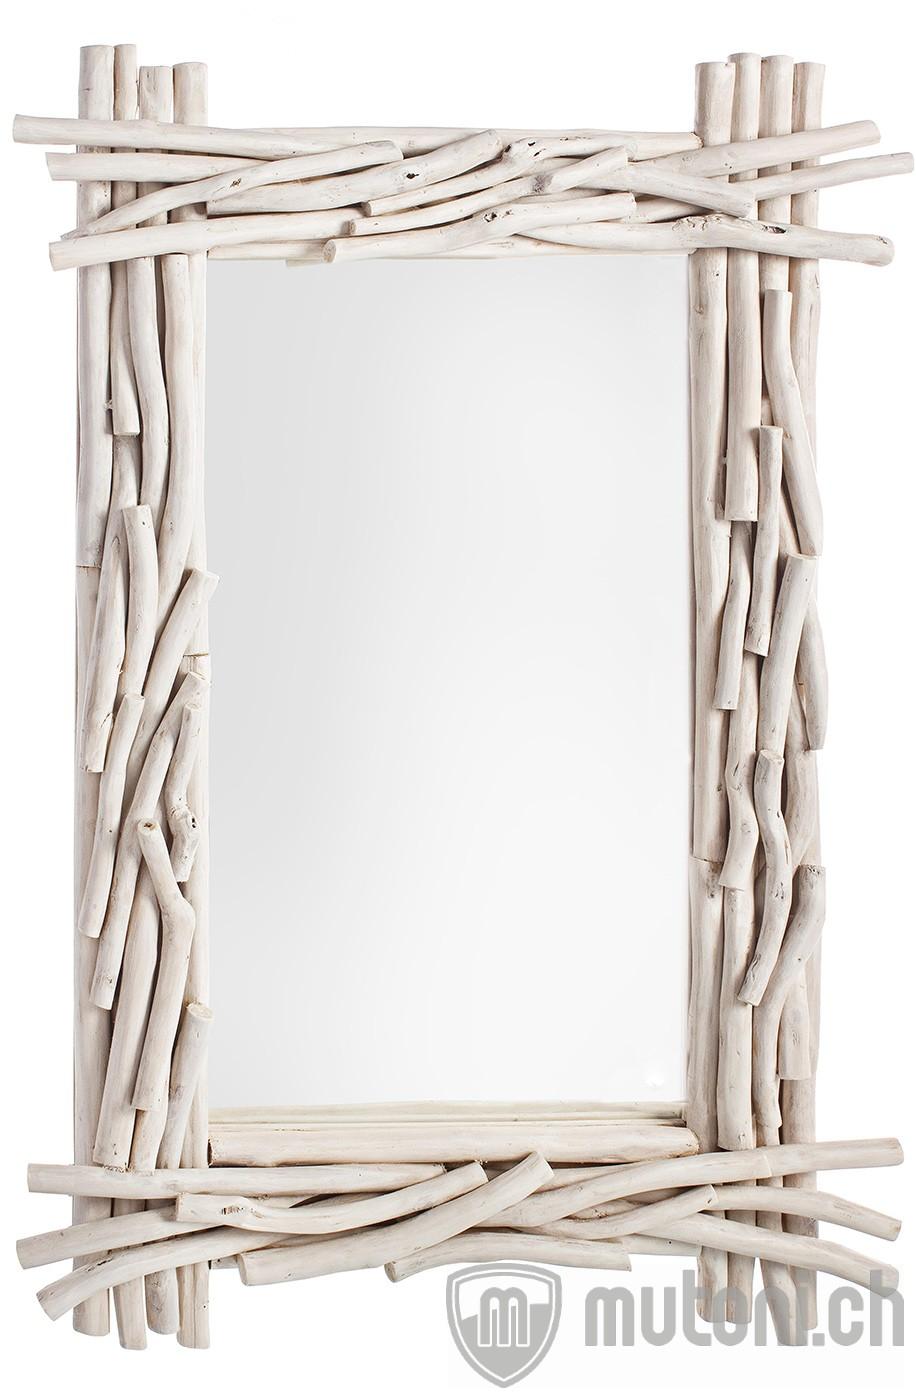 Spiegel sahel 90x60 wandspiegel spiegel accessoires for Spiegel 90x60